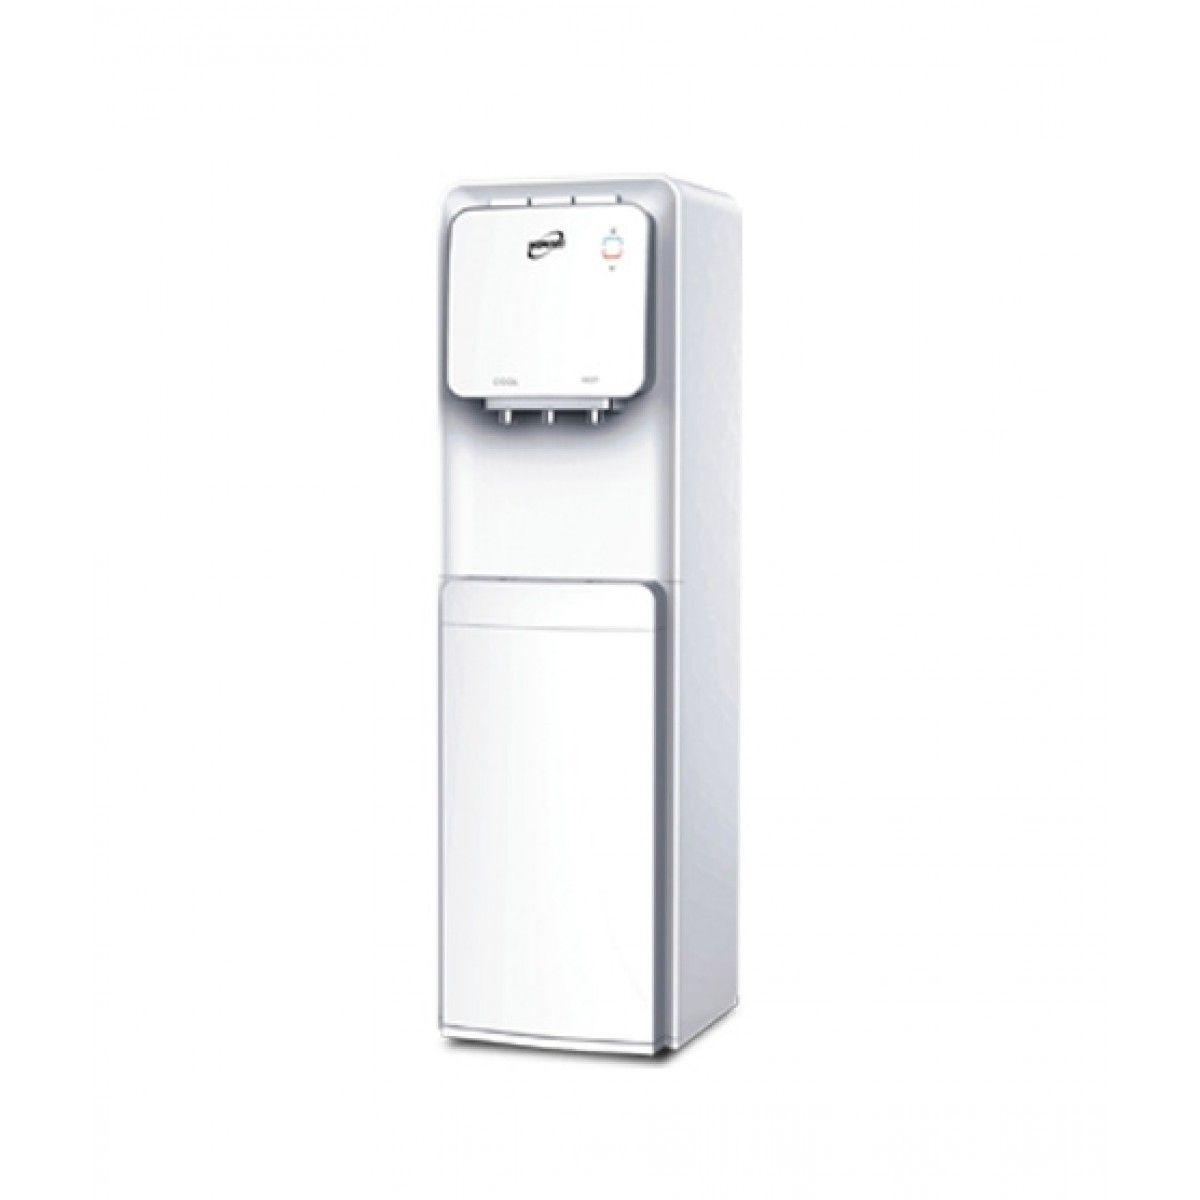 Homage 3 Taps HWD-44 Water Dispenser